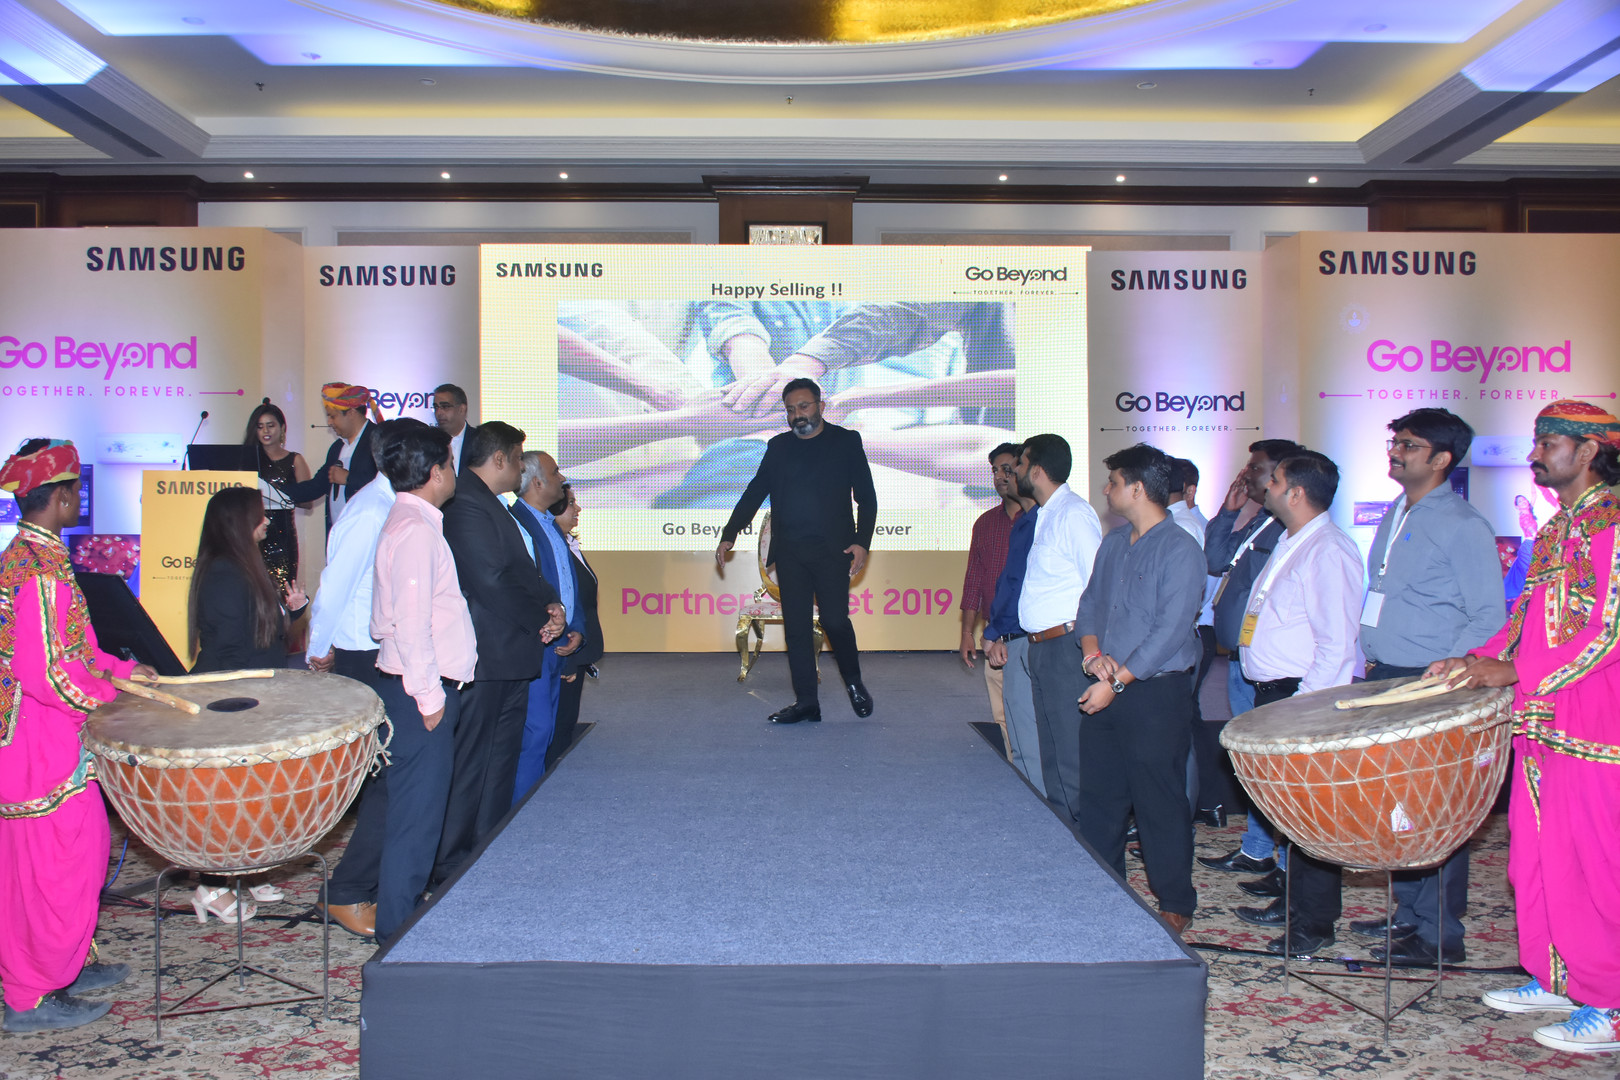 Samsung Events 003.JPG